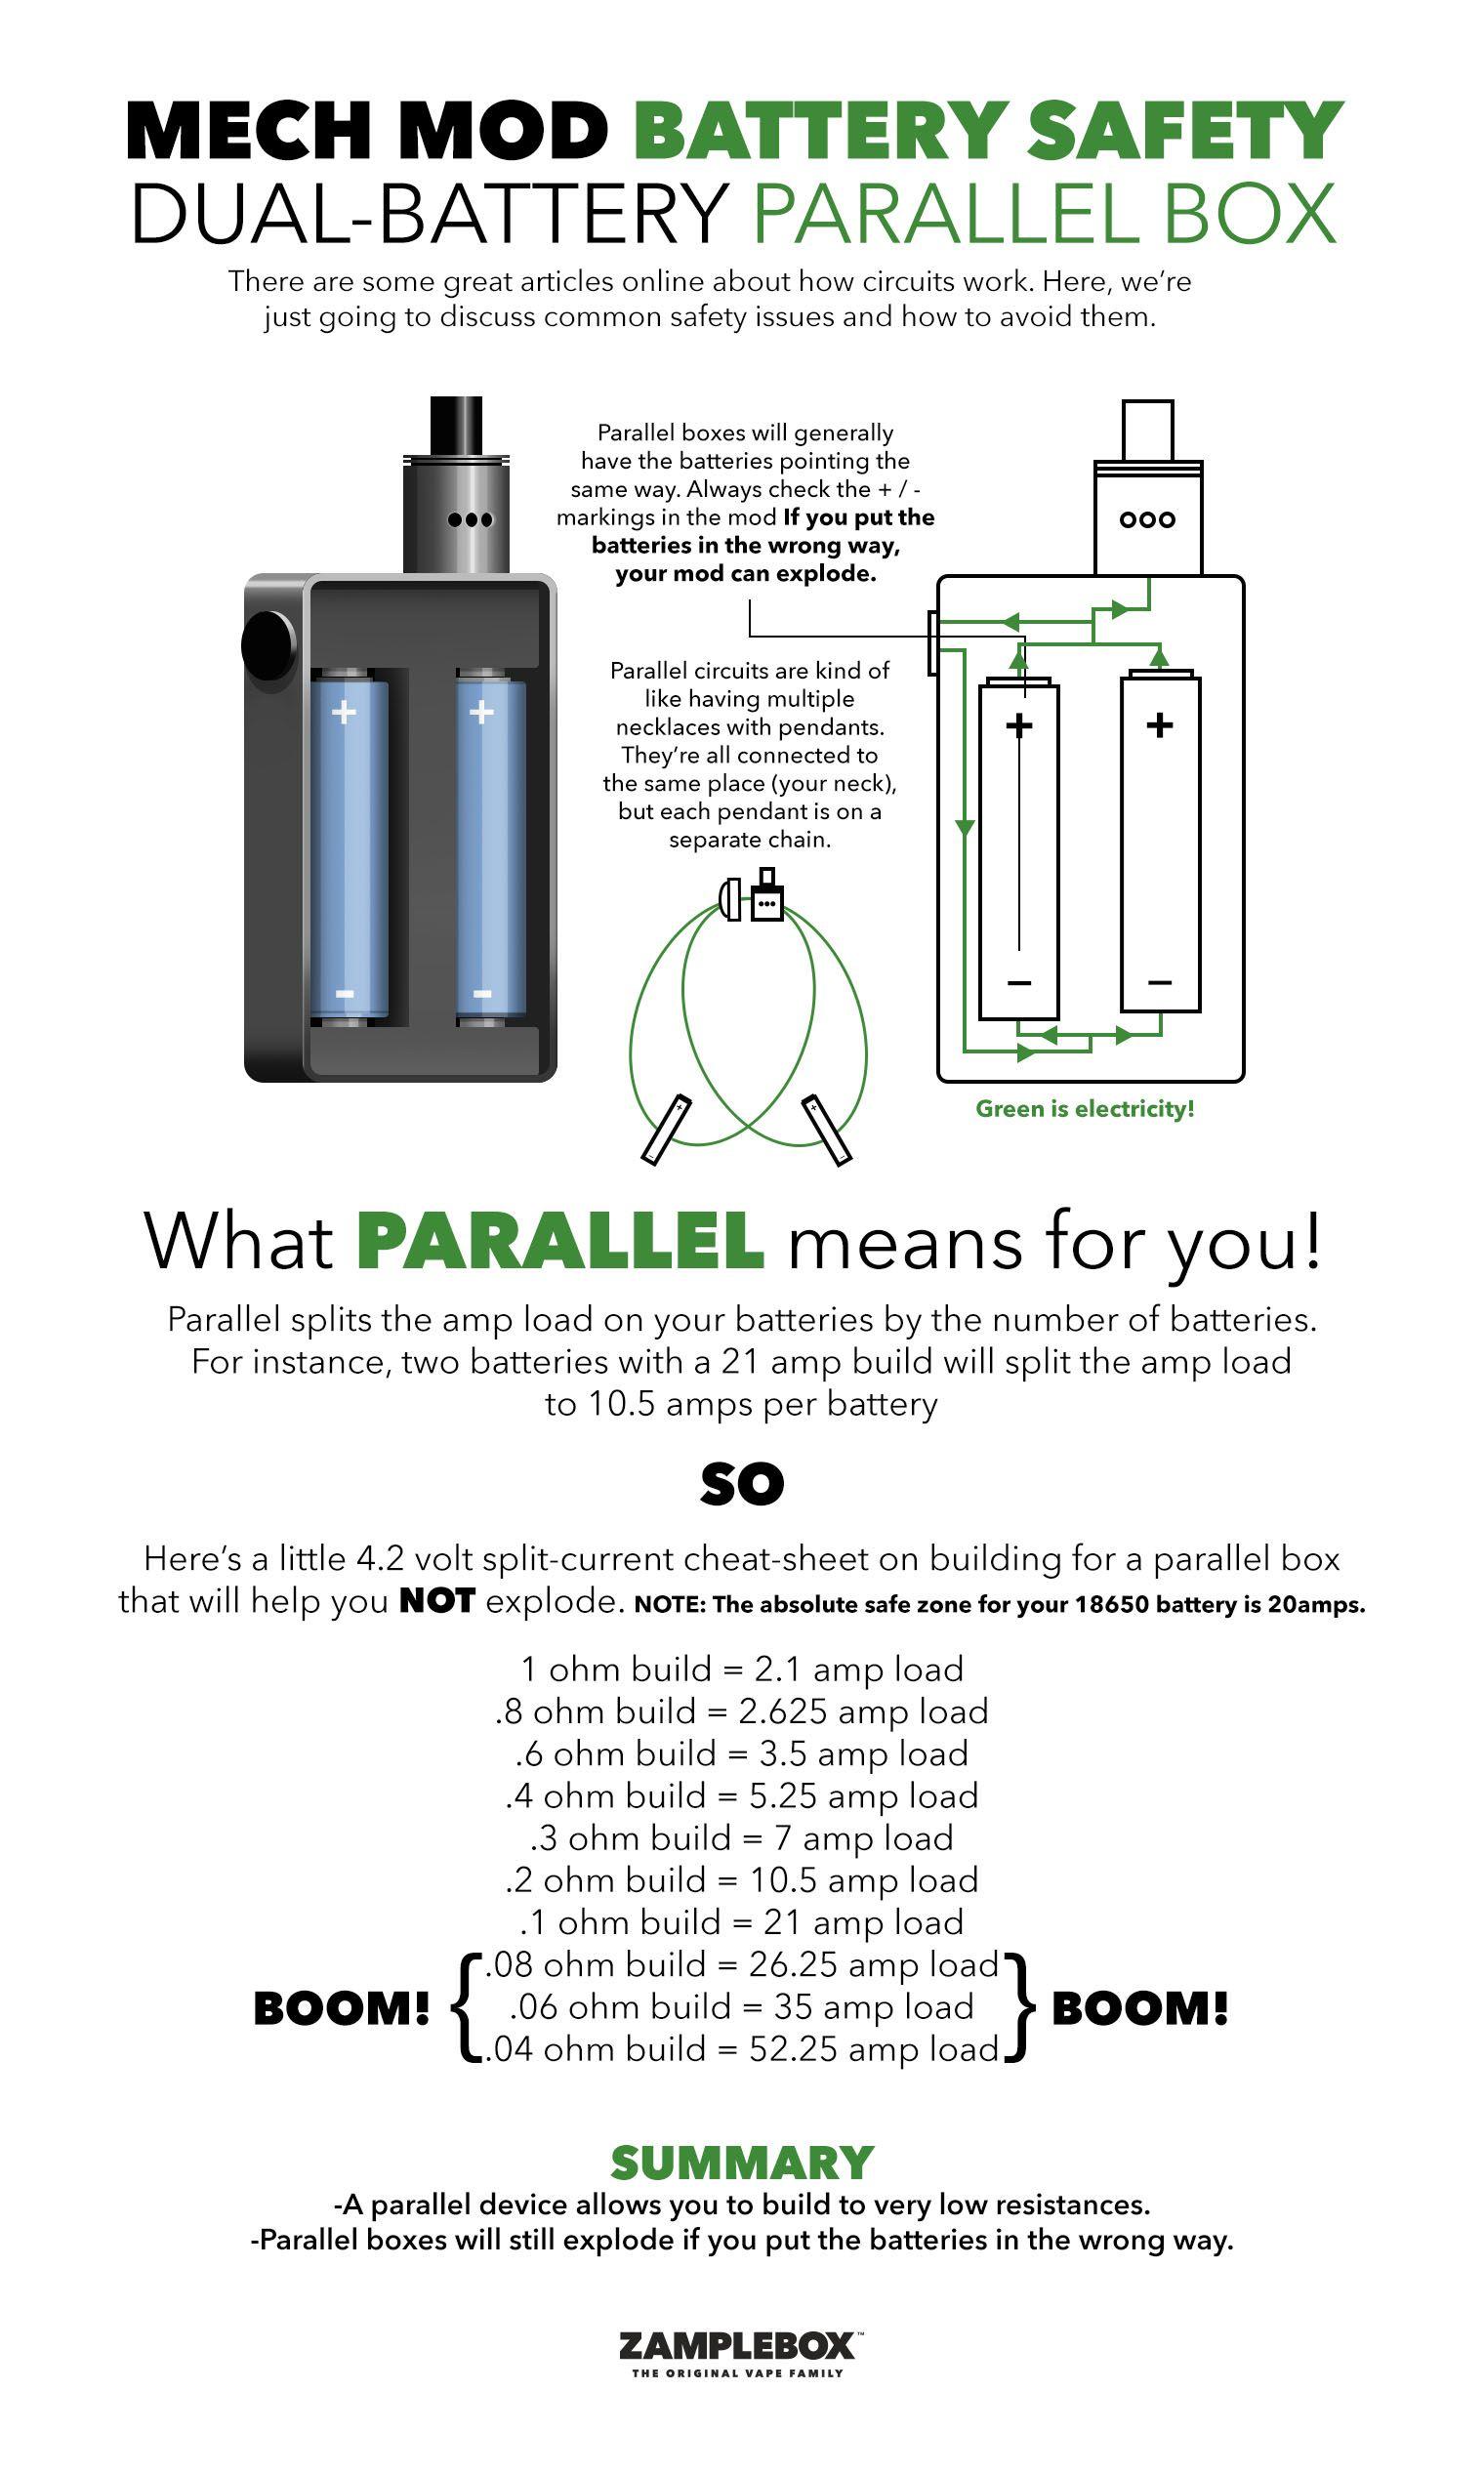 Unregulated Parallel Box Mod Vs Unregulated Series Box Mod Vaping Battery Safety Vape Mods Box Vape Diy Diy Box Mod